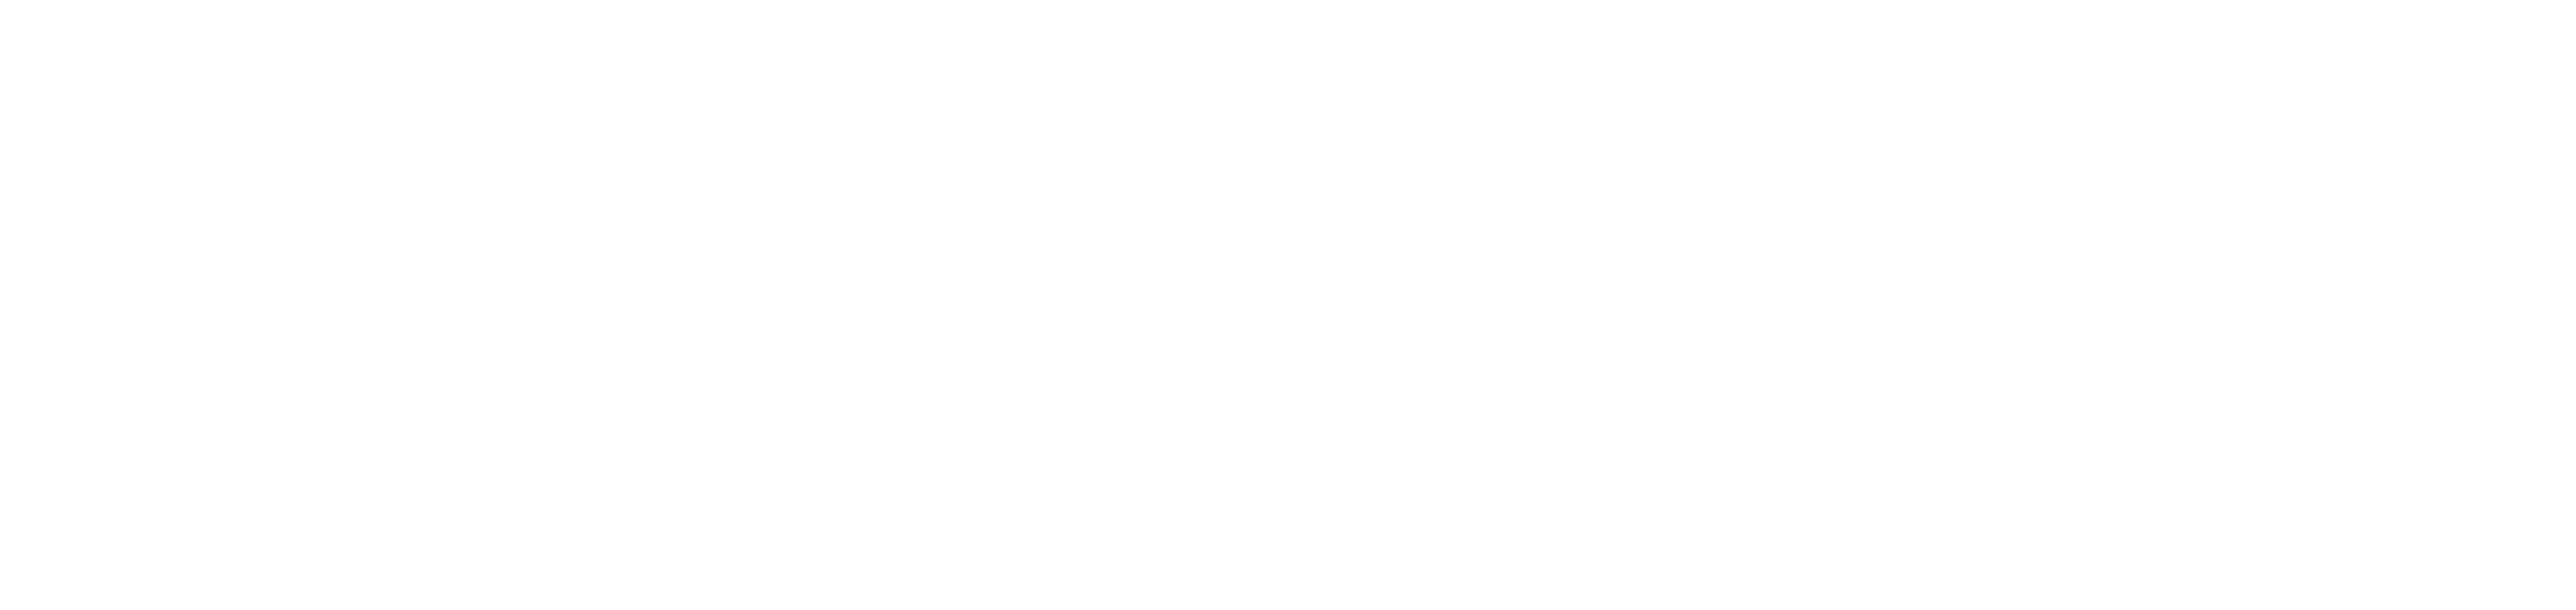 weisesdesign